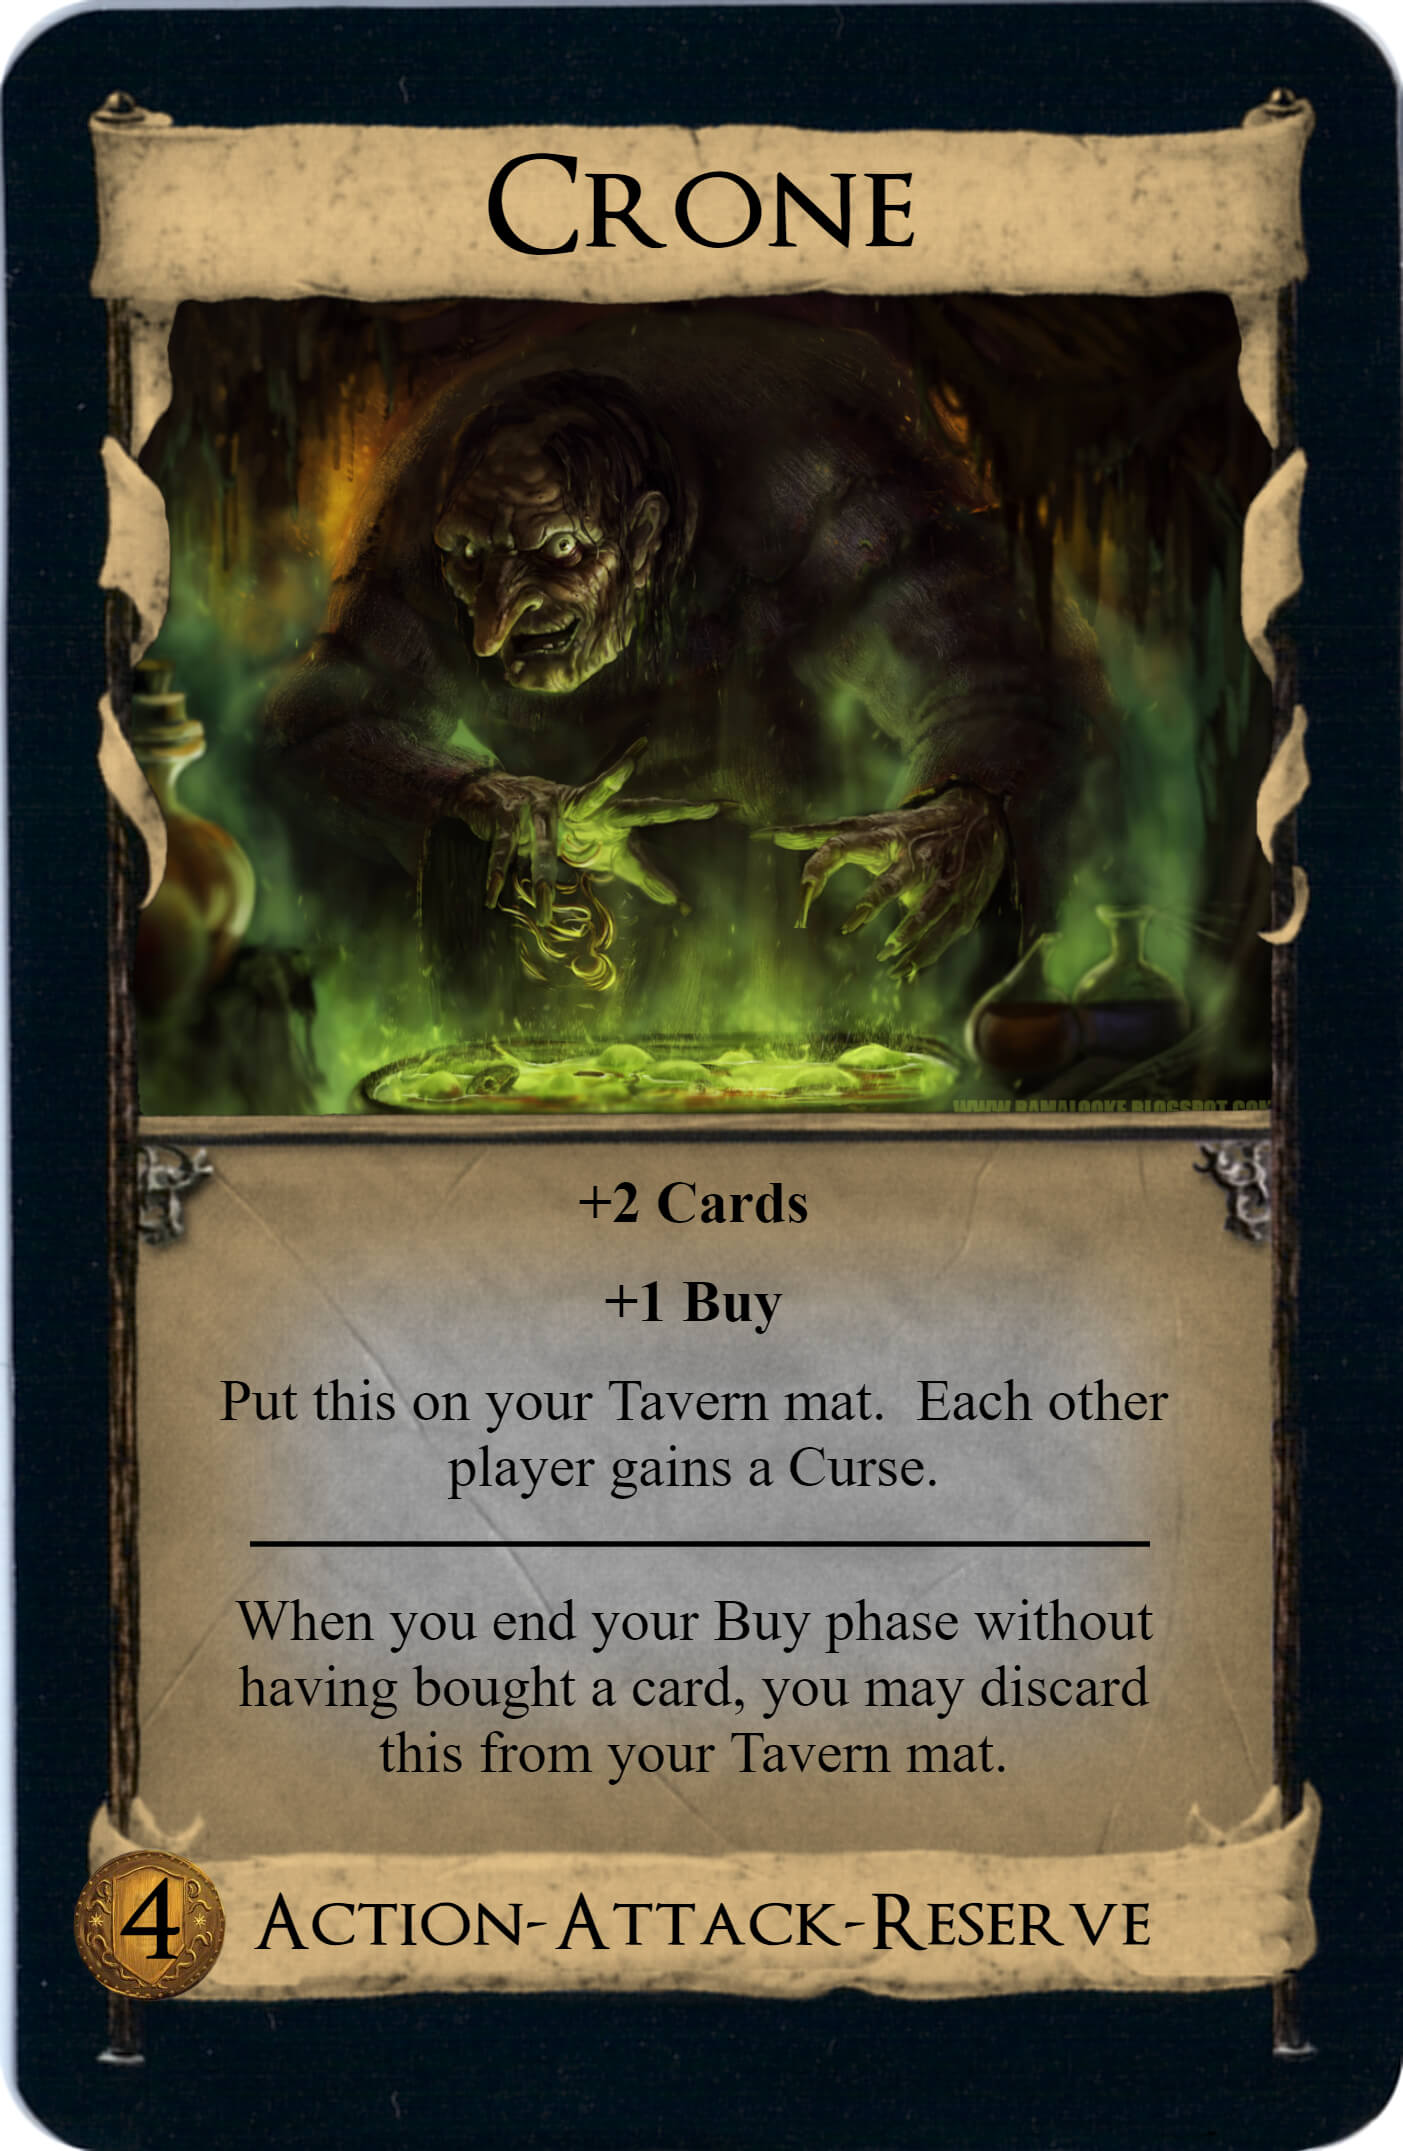 Dominion Card Image Generator Regarding Dominion Card Template